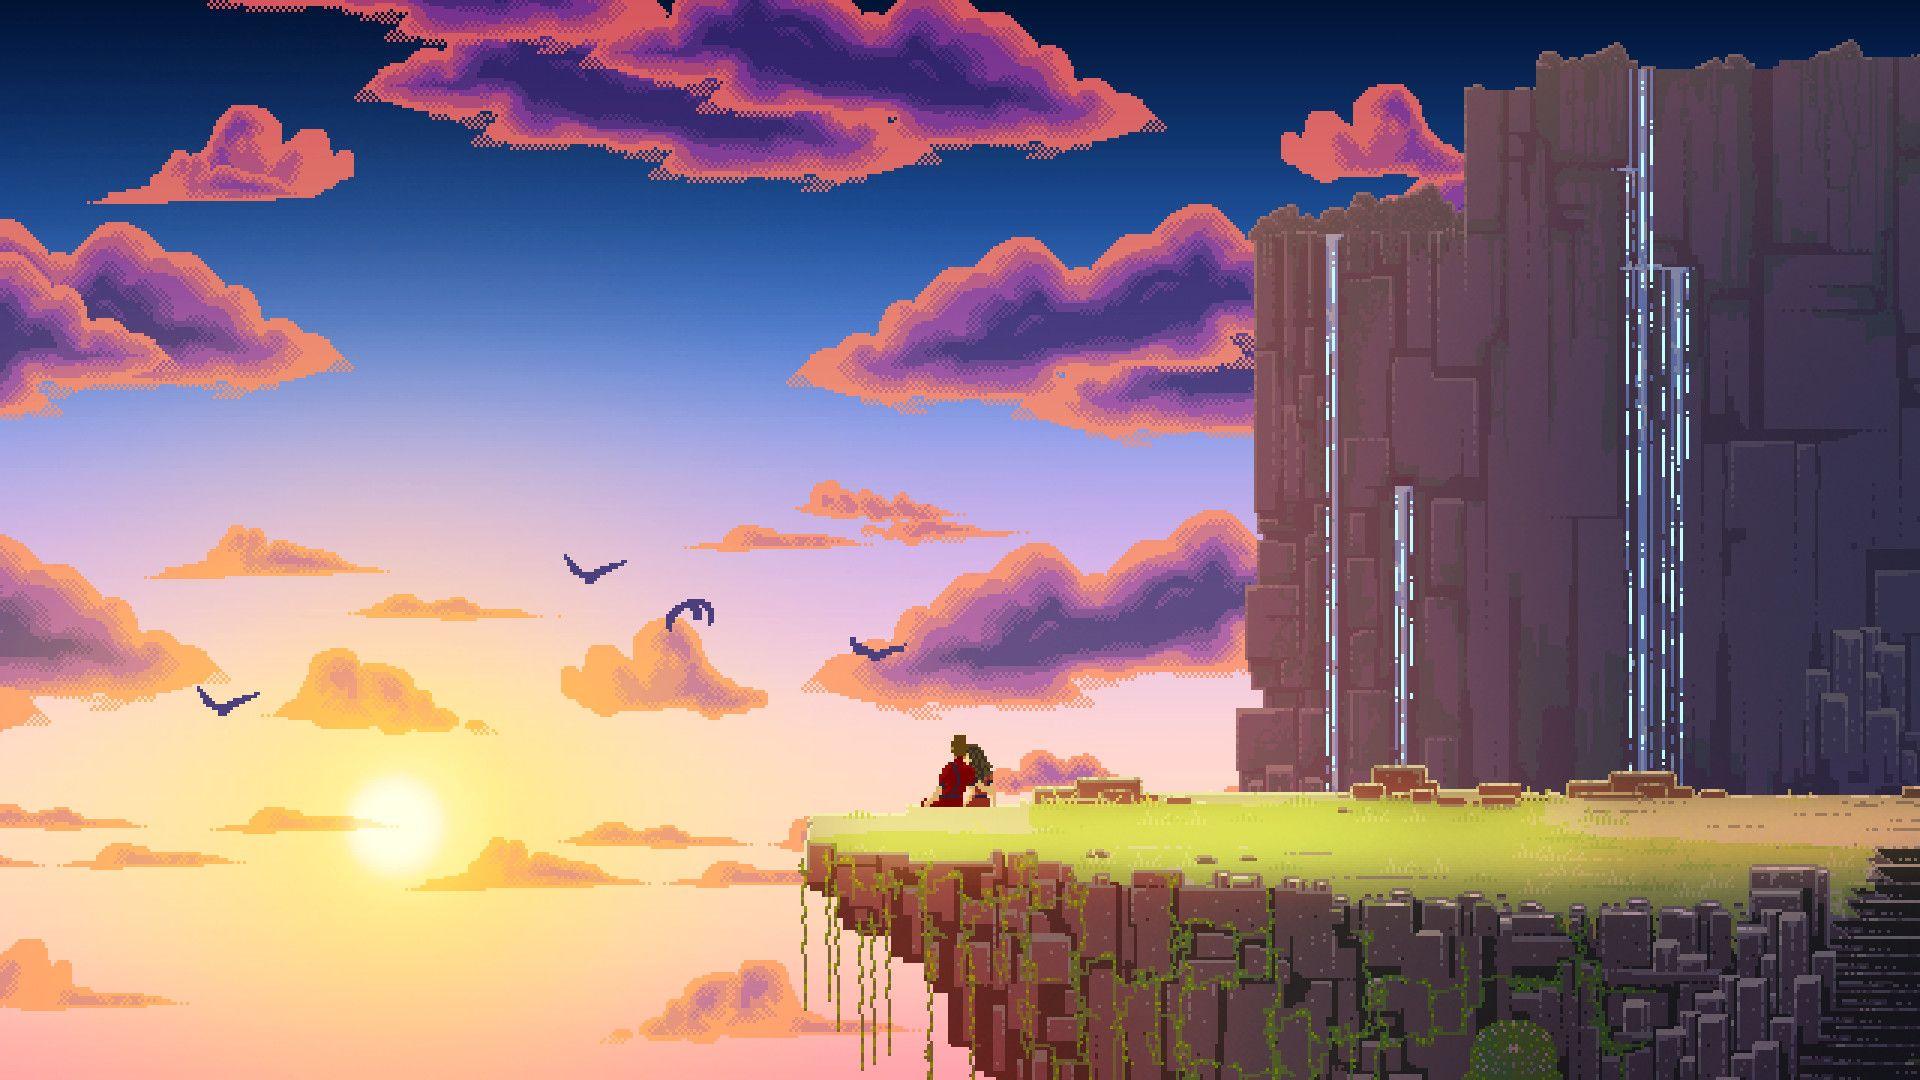 Pixel Art Wallpapers In 2020 Pixel Art Landscape Desktop Wallpaper Art Pixel Art